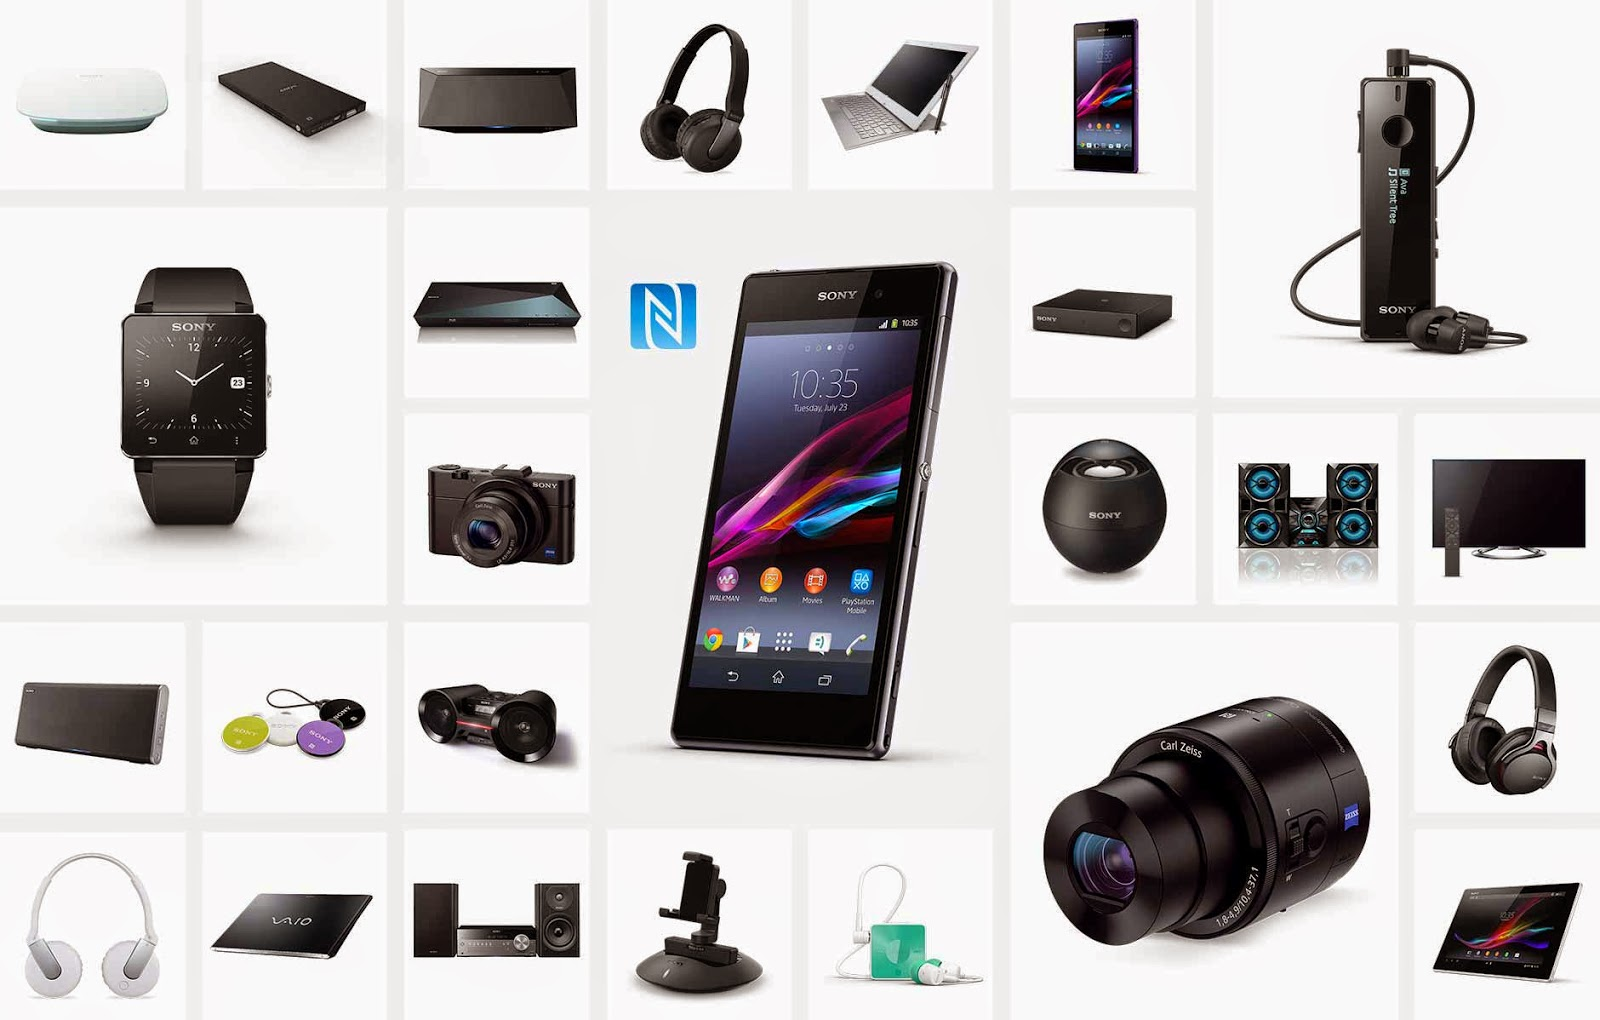 Cep Telefonu Aksesuar Marketi: Sony Cep Telefonu Aksesuarları